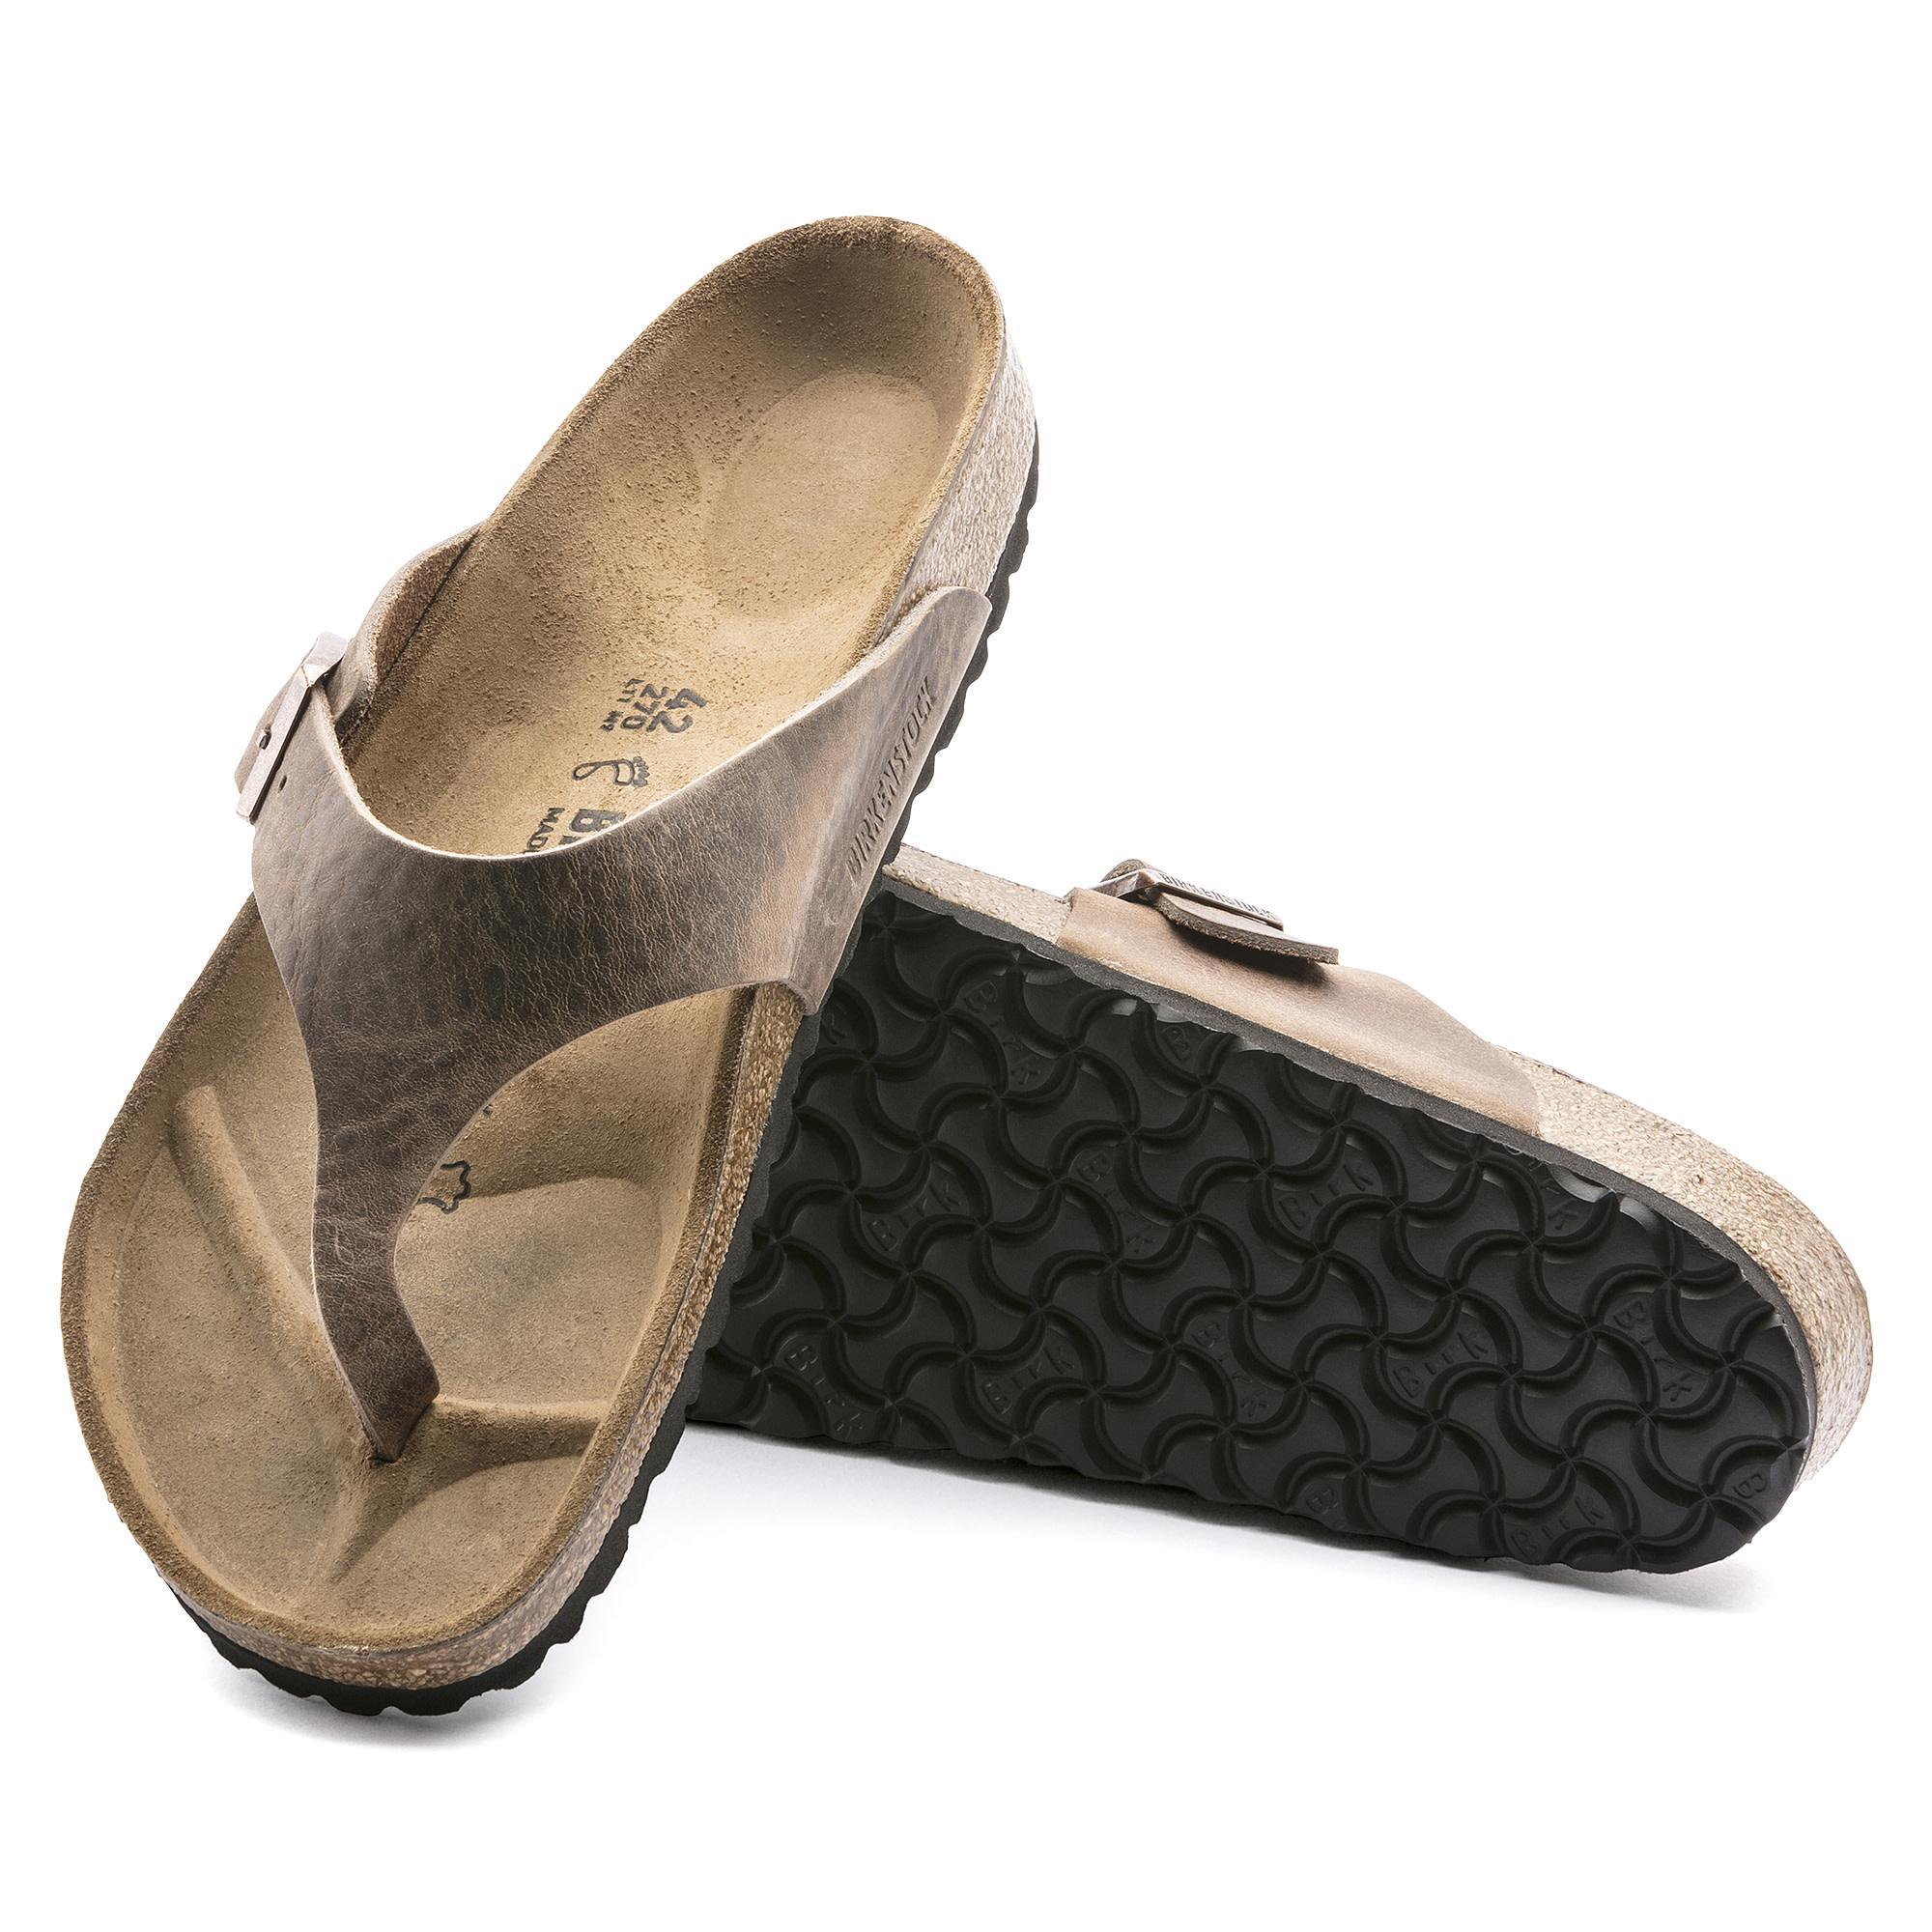 Birkenstock Birkenstock Como Oiled Leather (Hommes - Régulier) - Tobacco